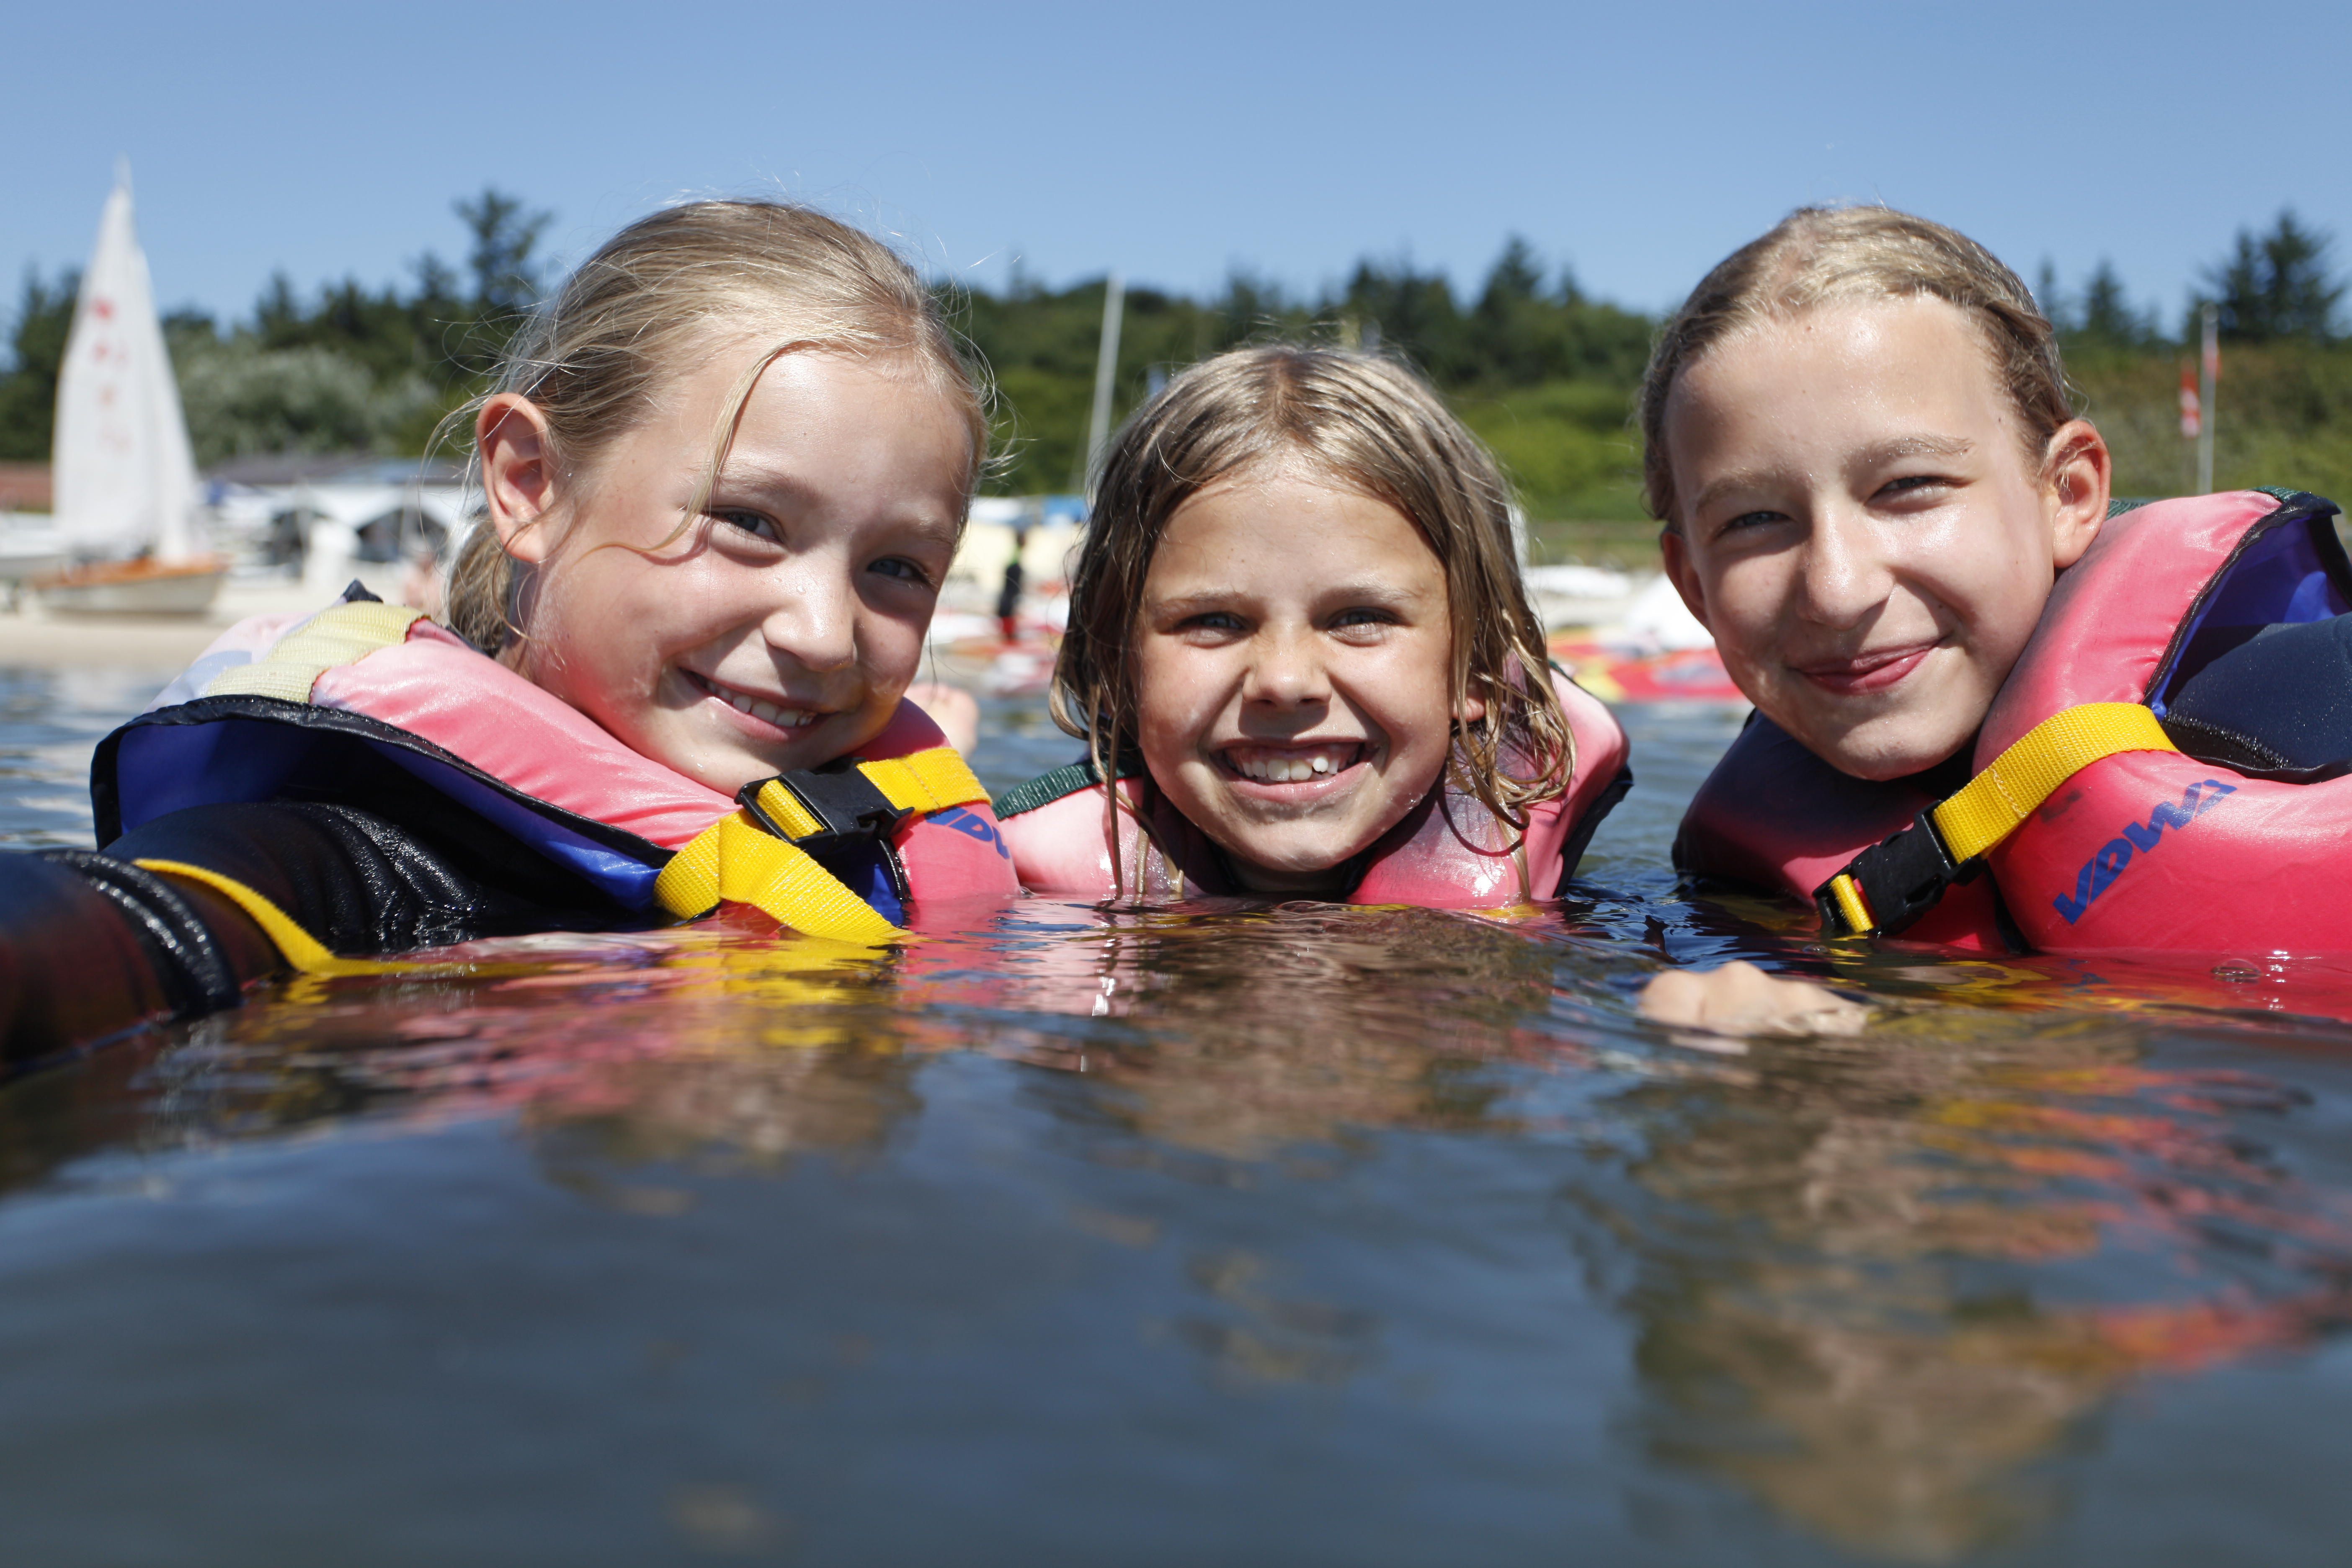 Segelschule Sylt | Nordsee Segeln lernen für Kids